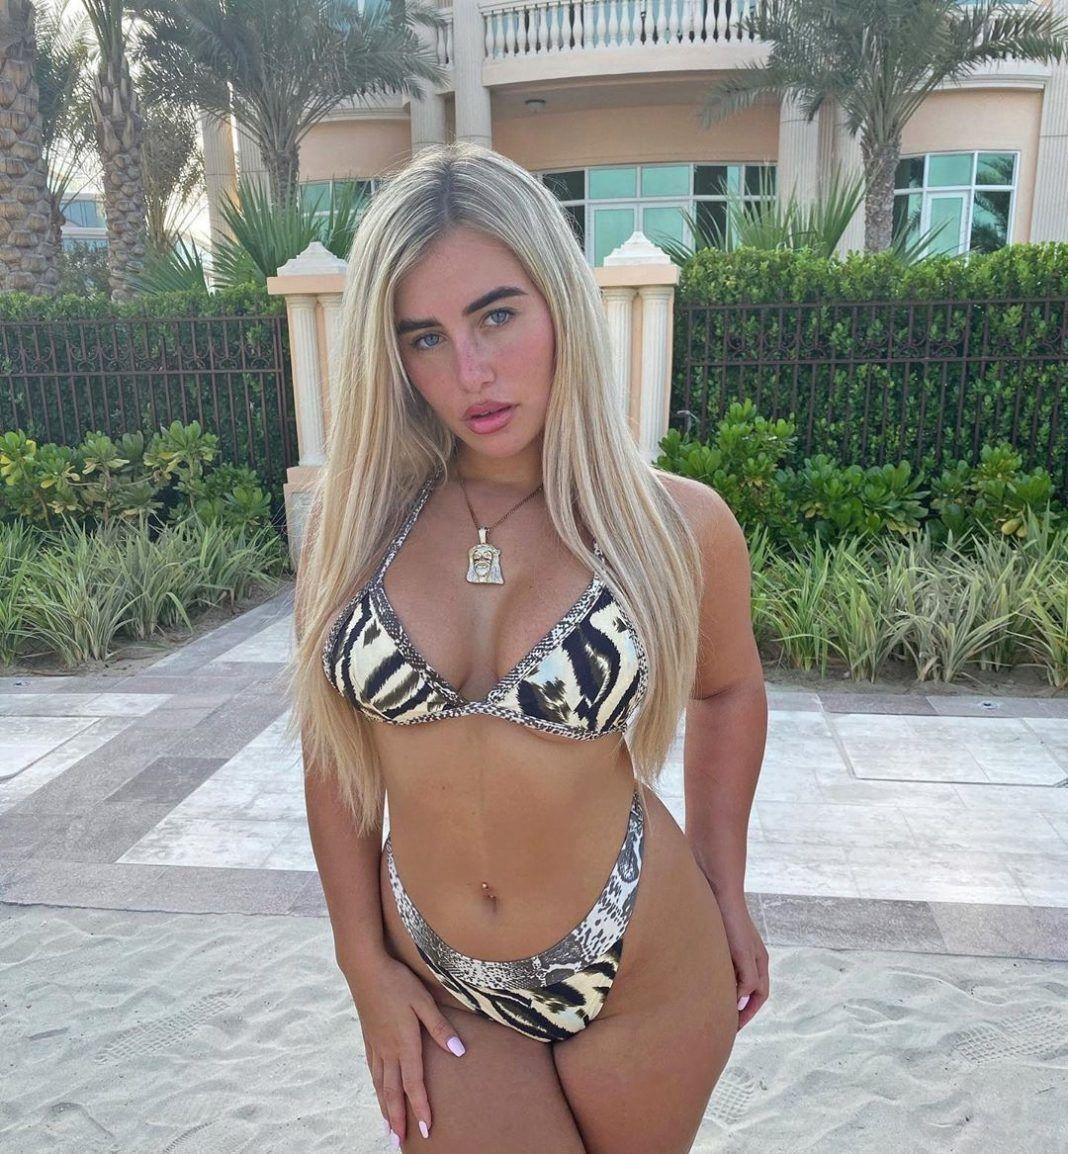 Ellie brown hot bikini pics